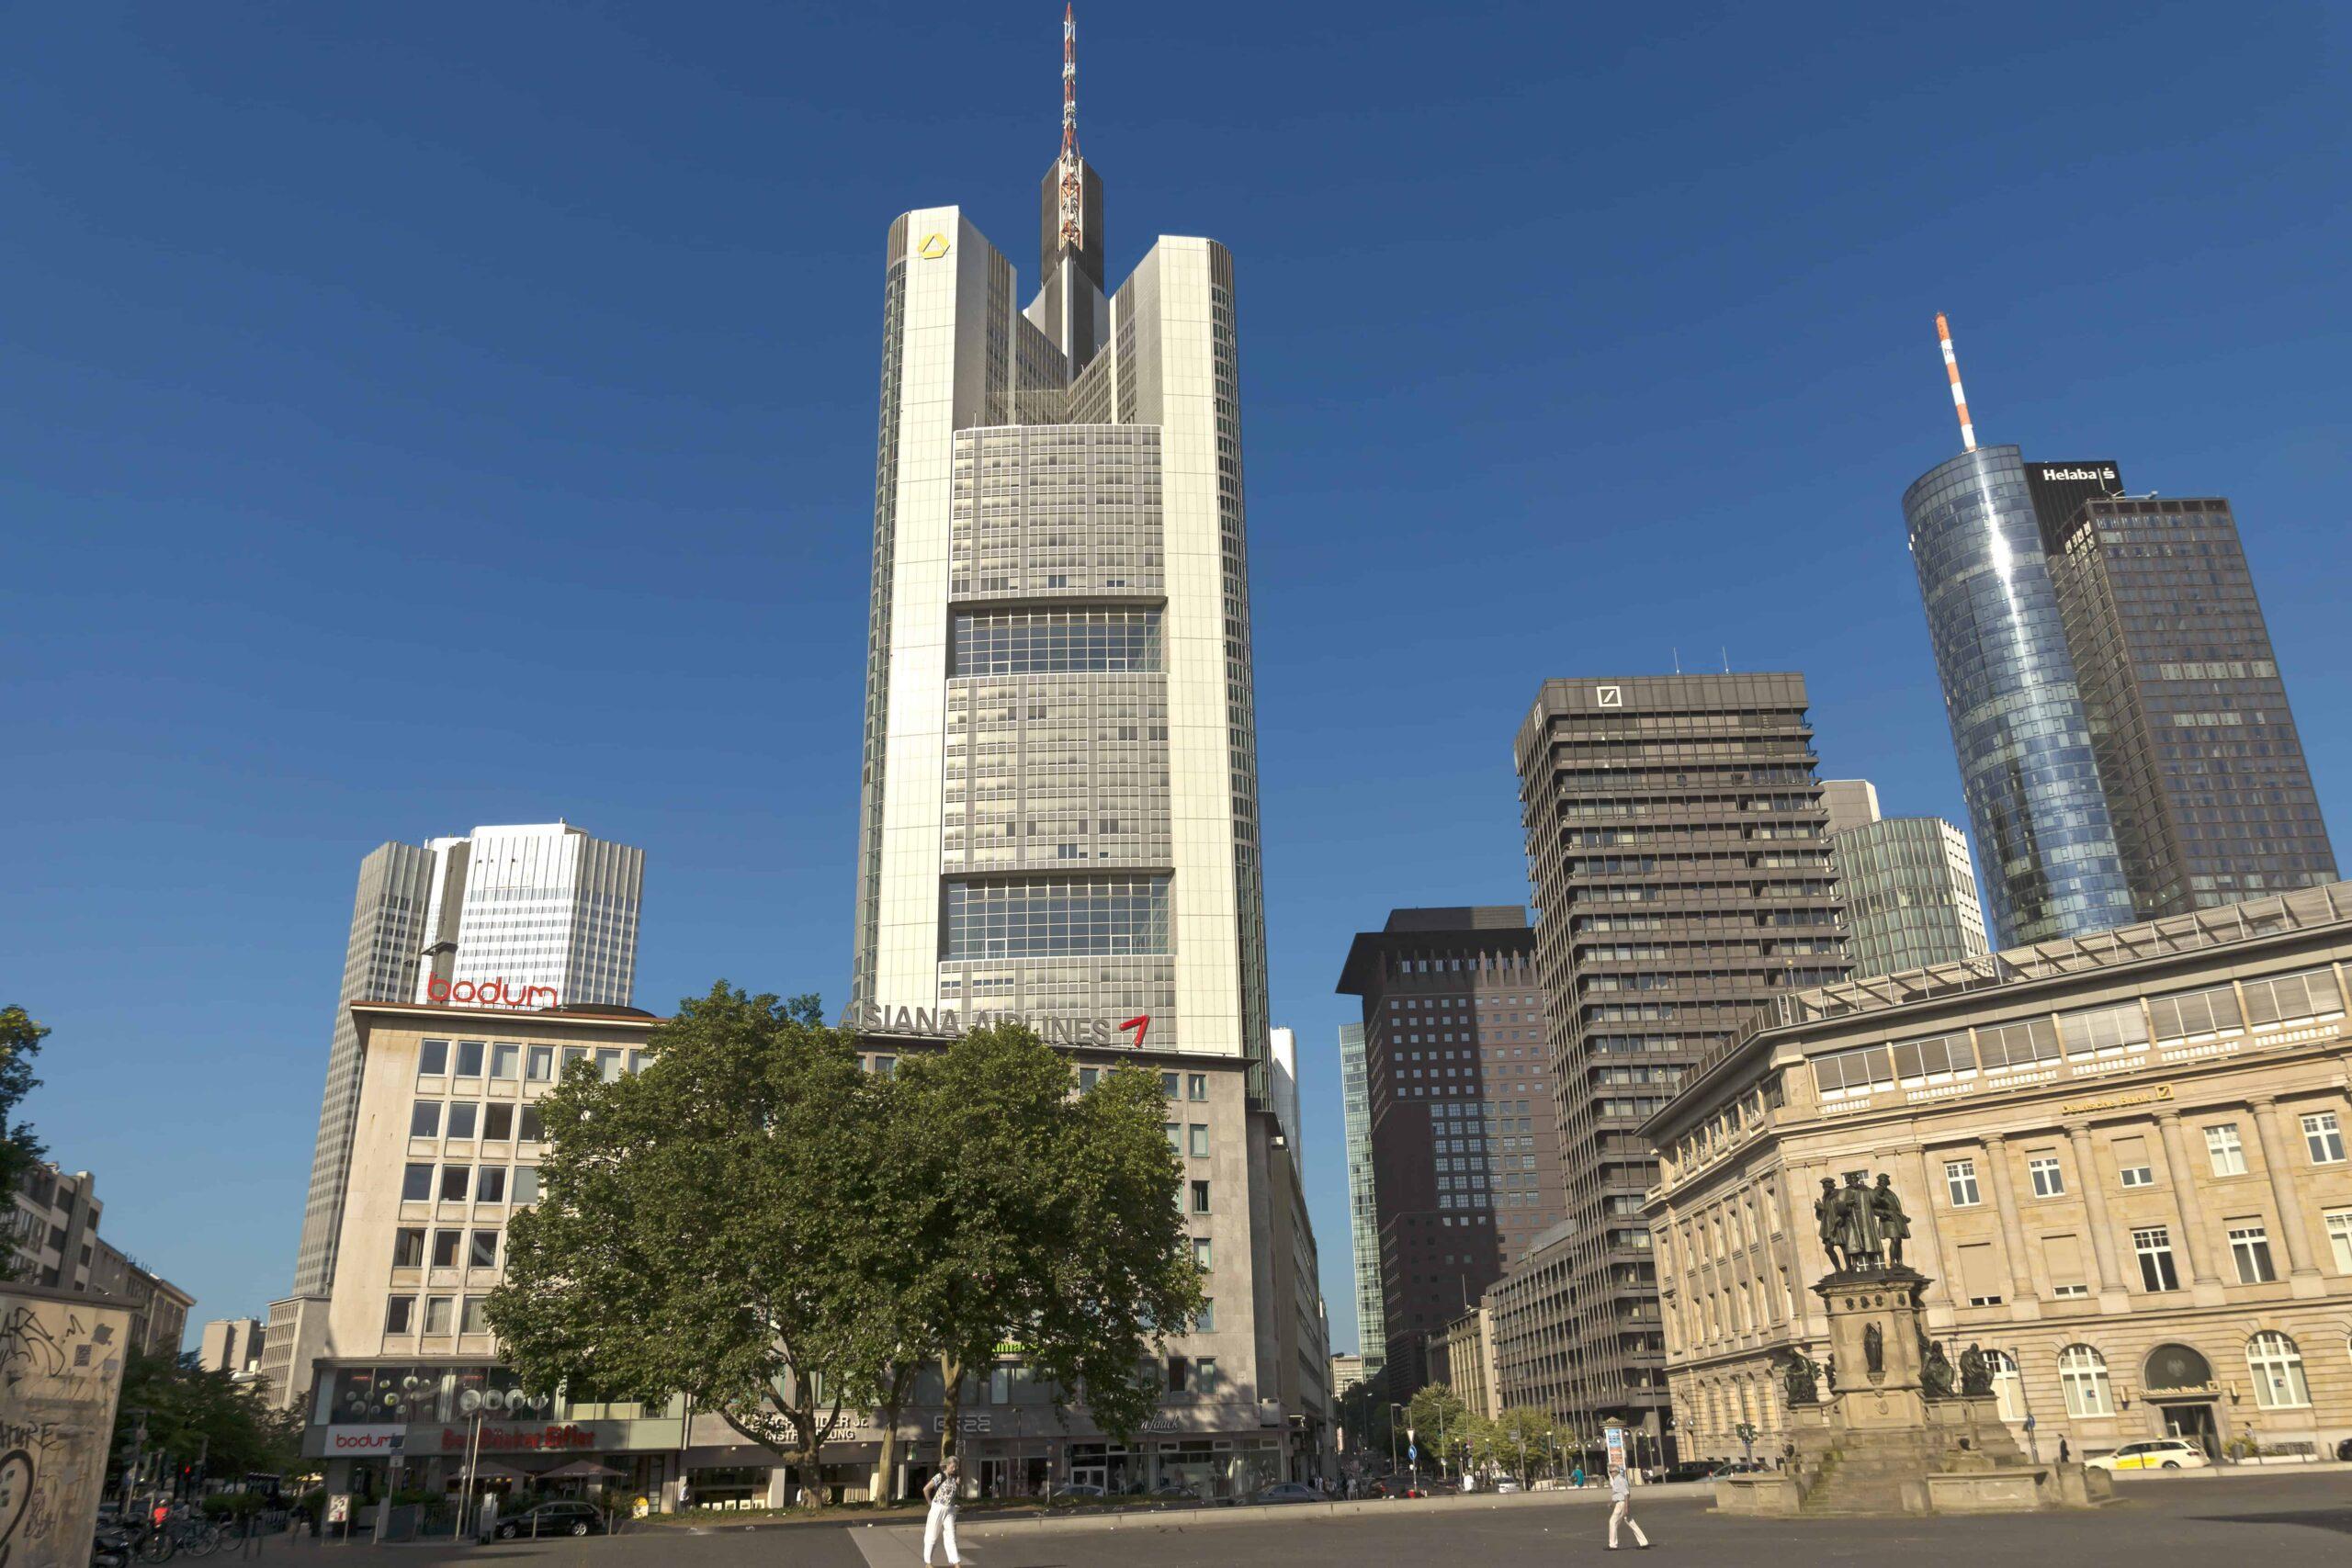 Aluminum Building — The Commerzbank tower